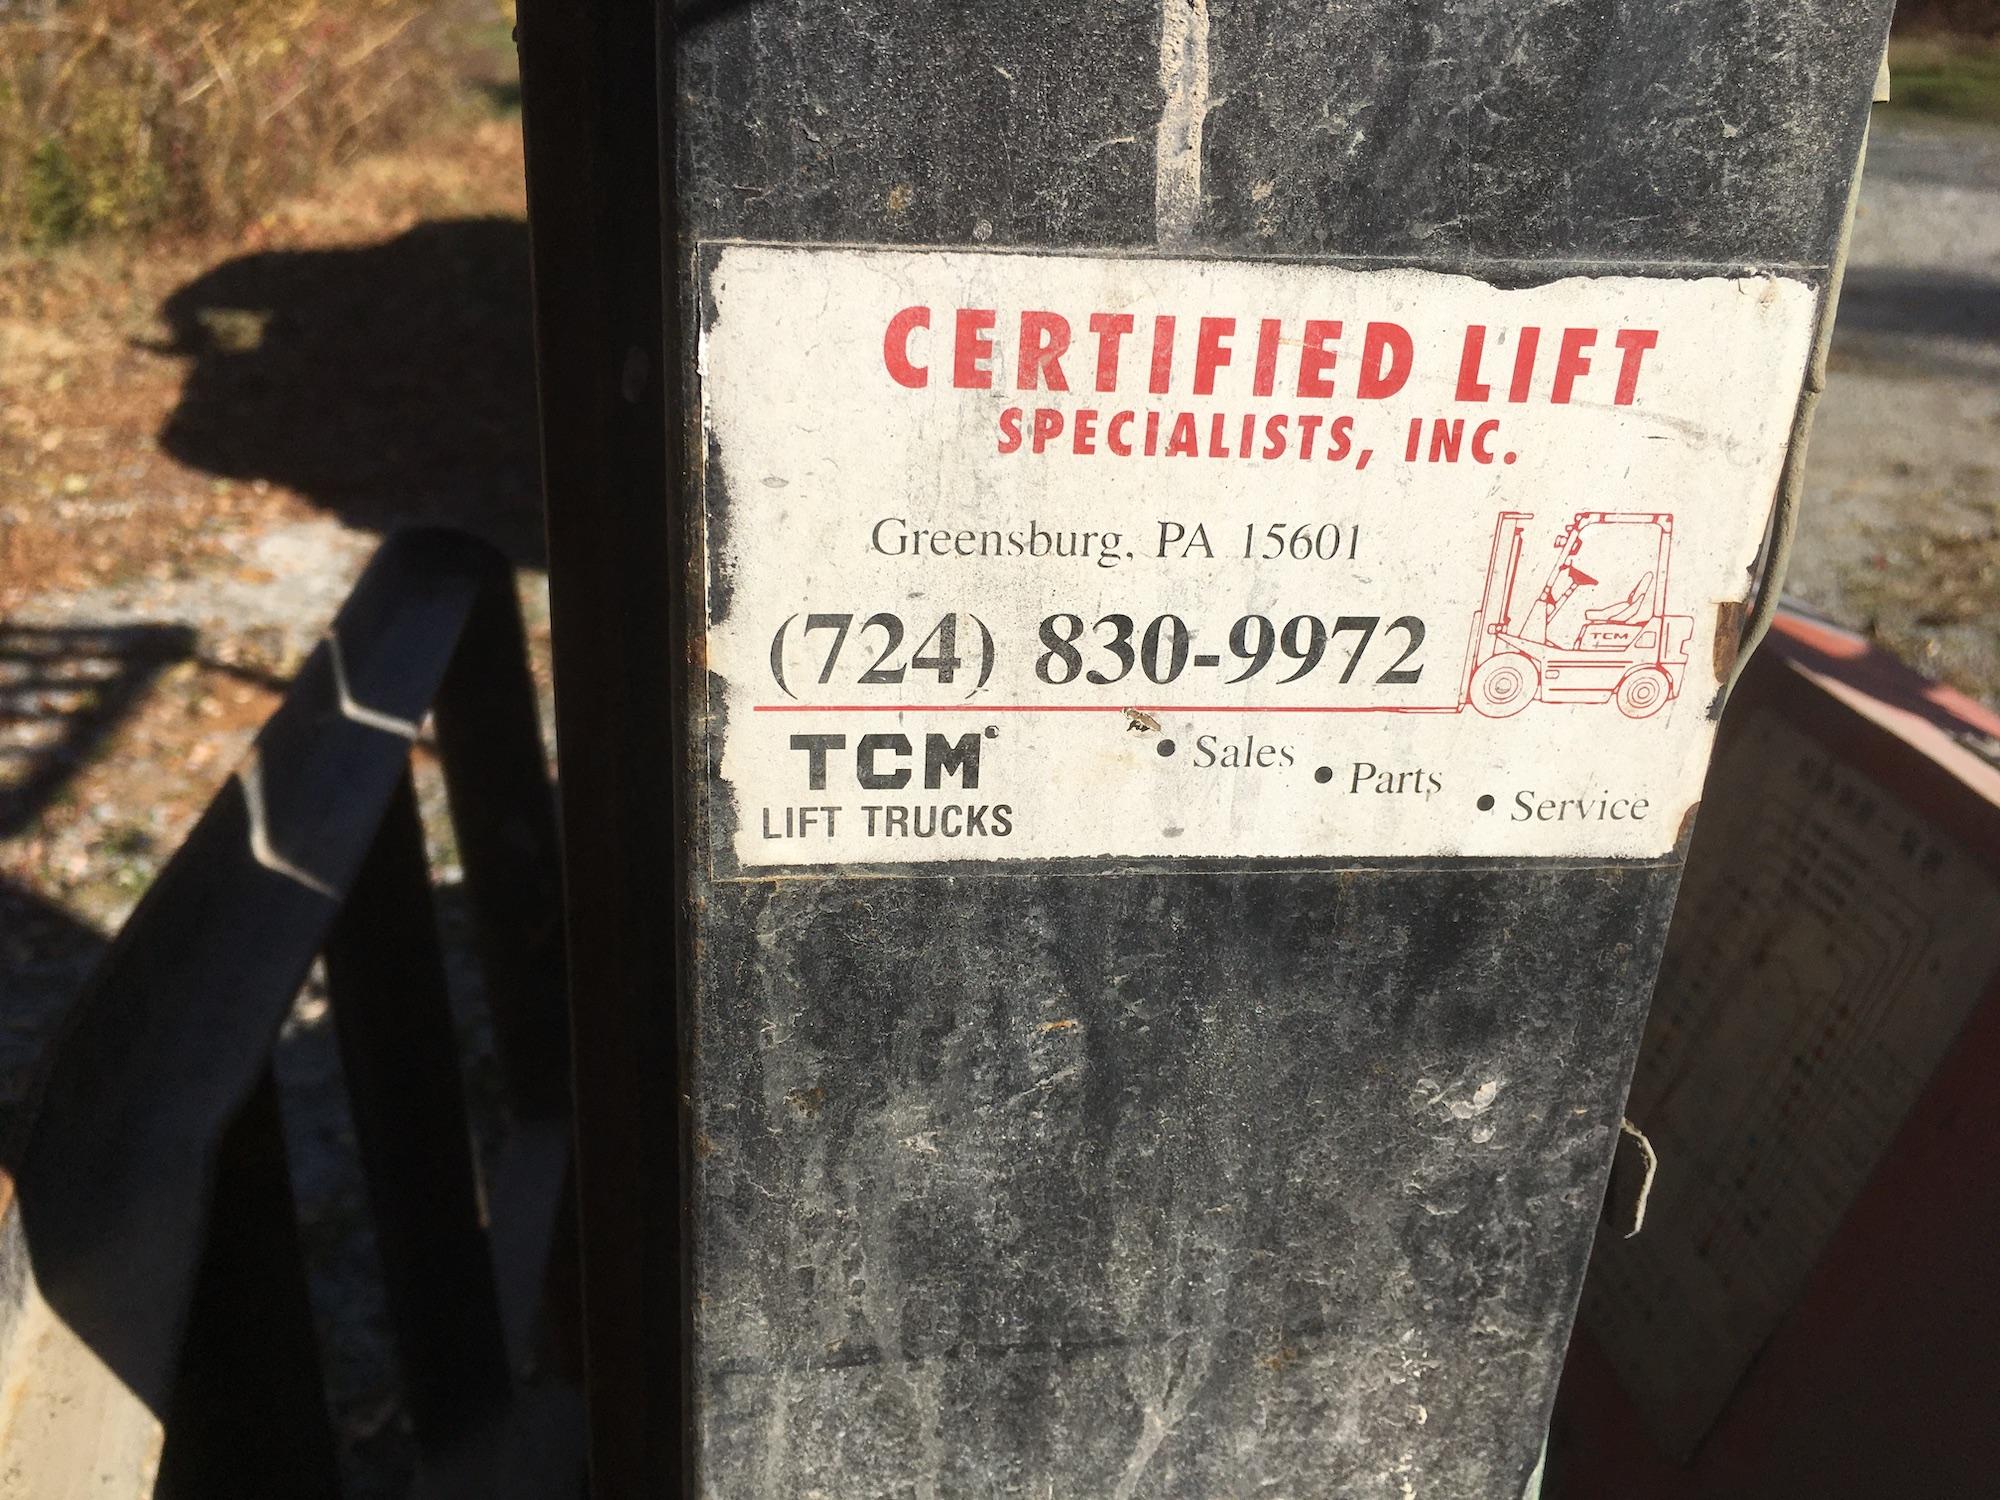 TCM-M300257-Forklift-06